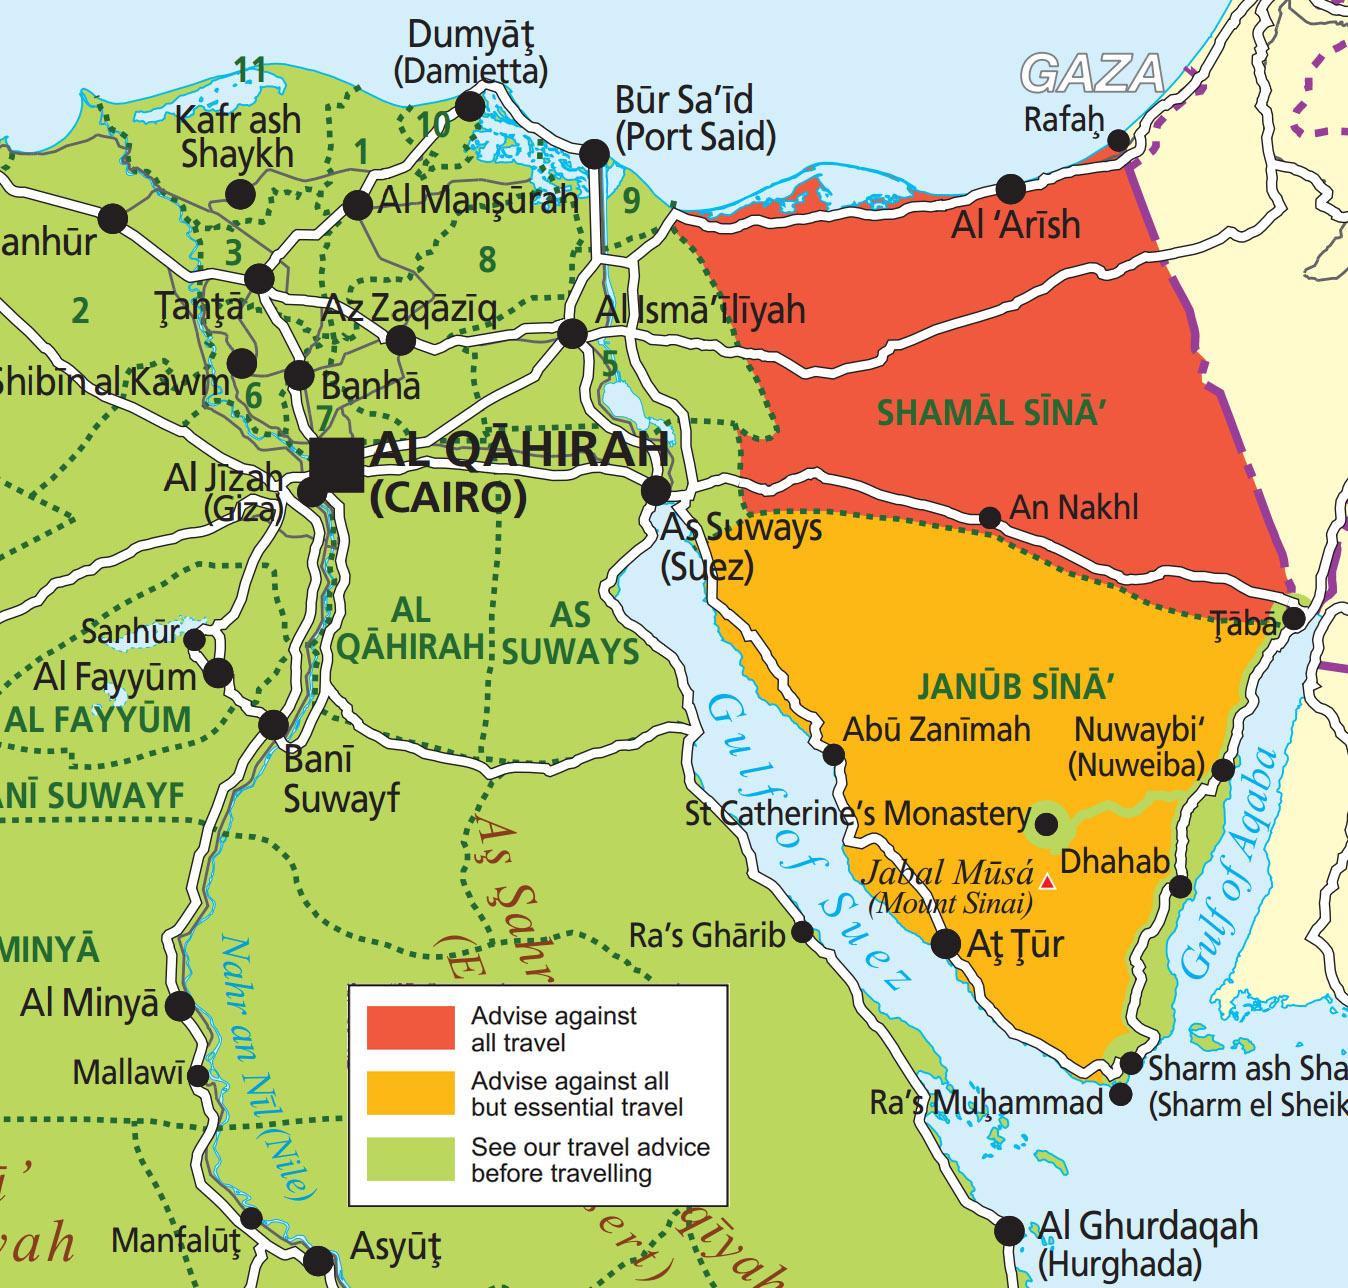 Karte Von ägypten.ägypten Karte ägypten König